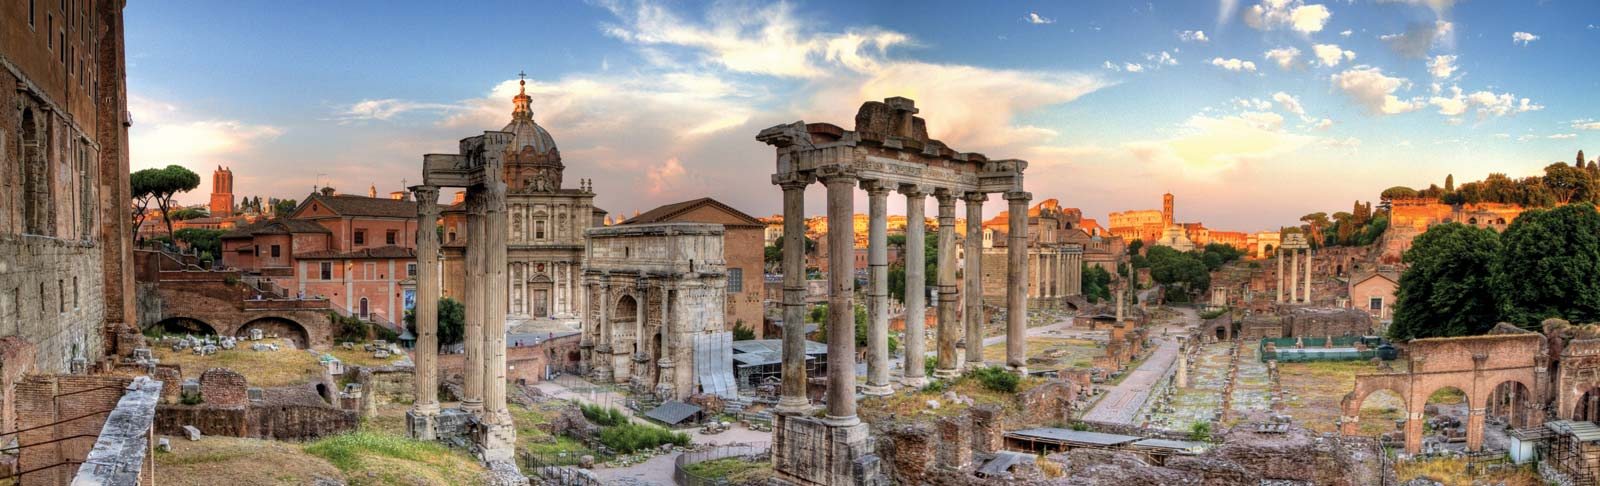 ruins-forum-rome.jpg